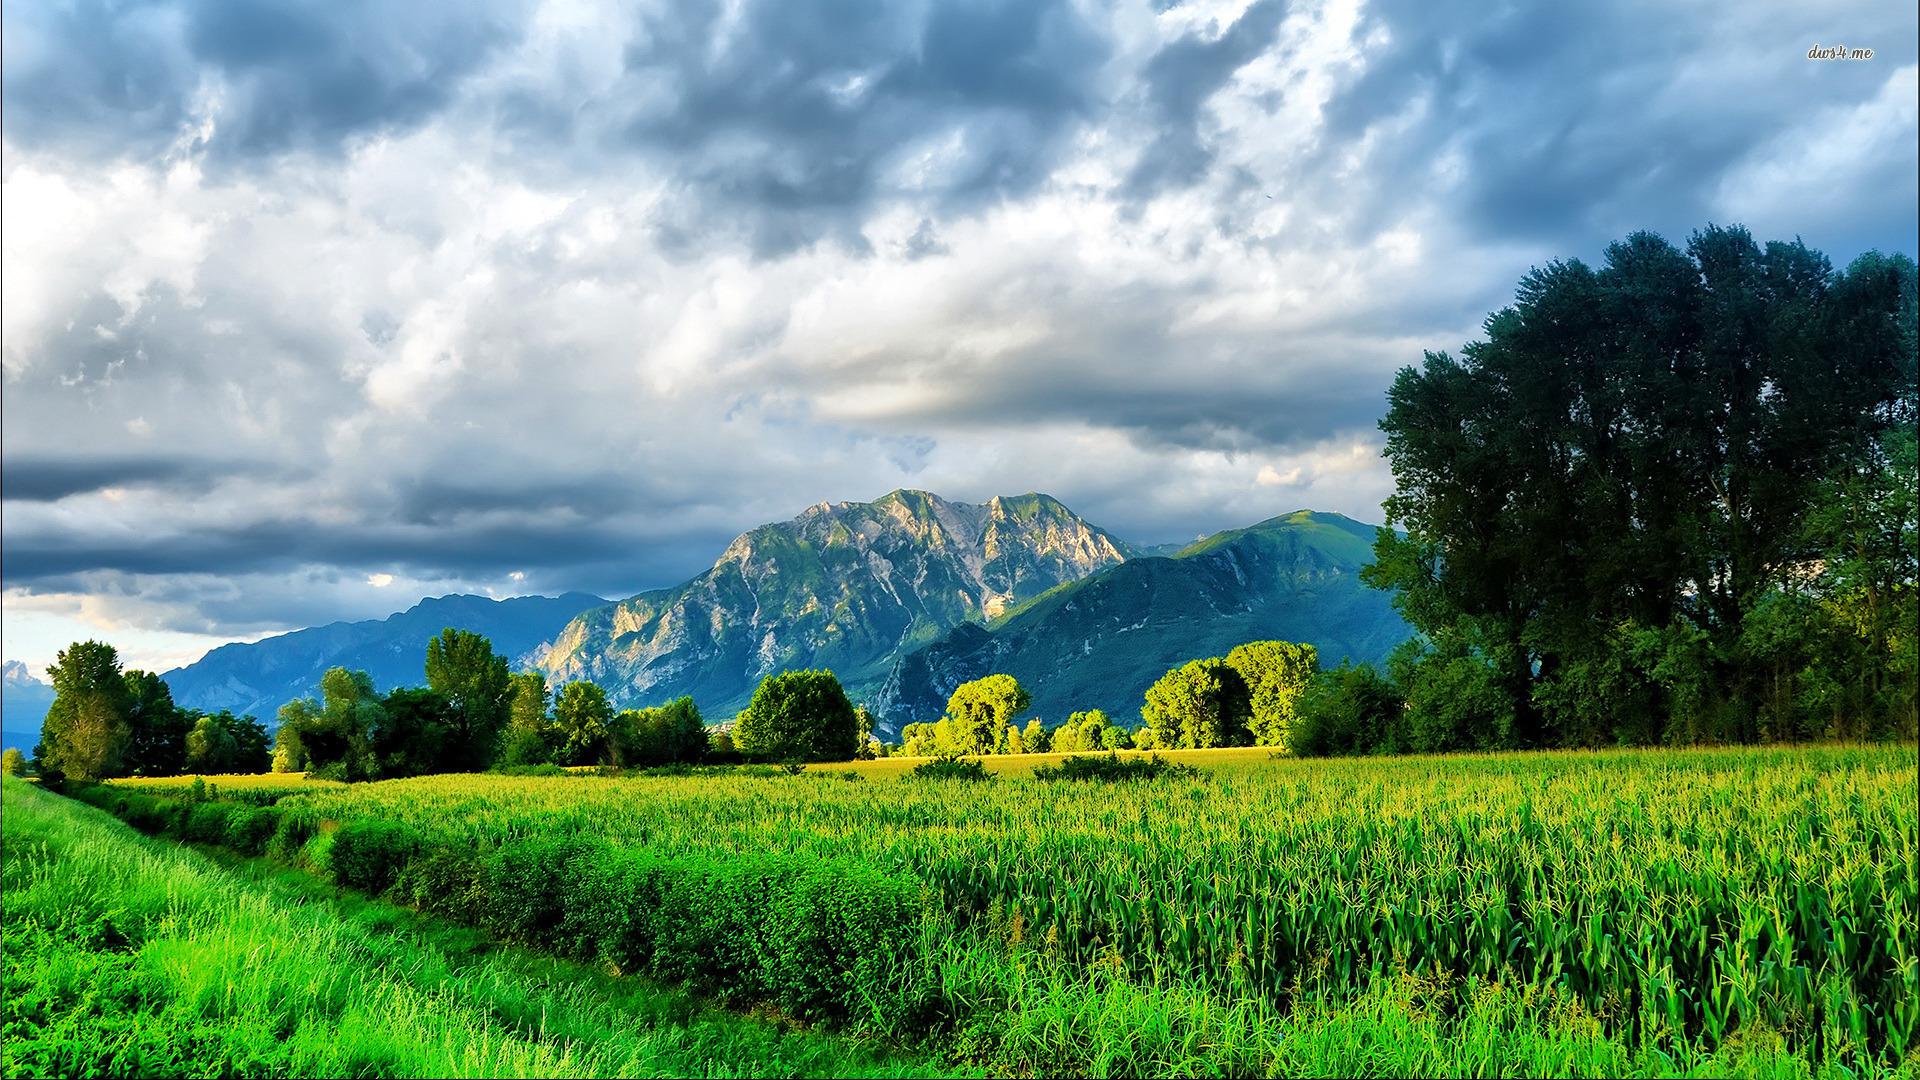 Landscapes hd